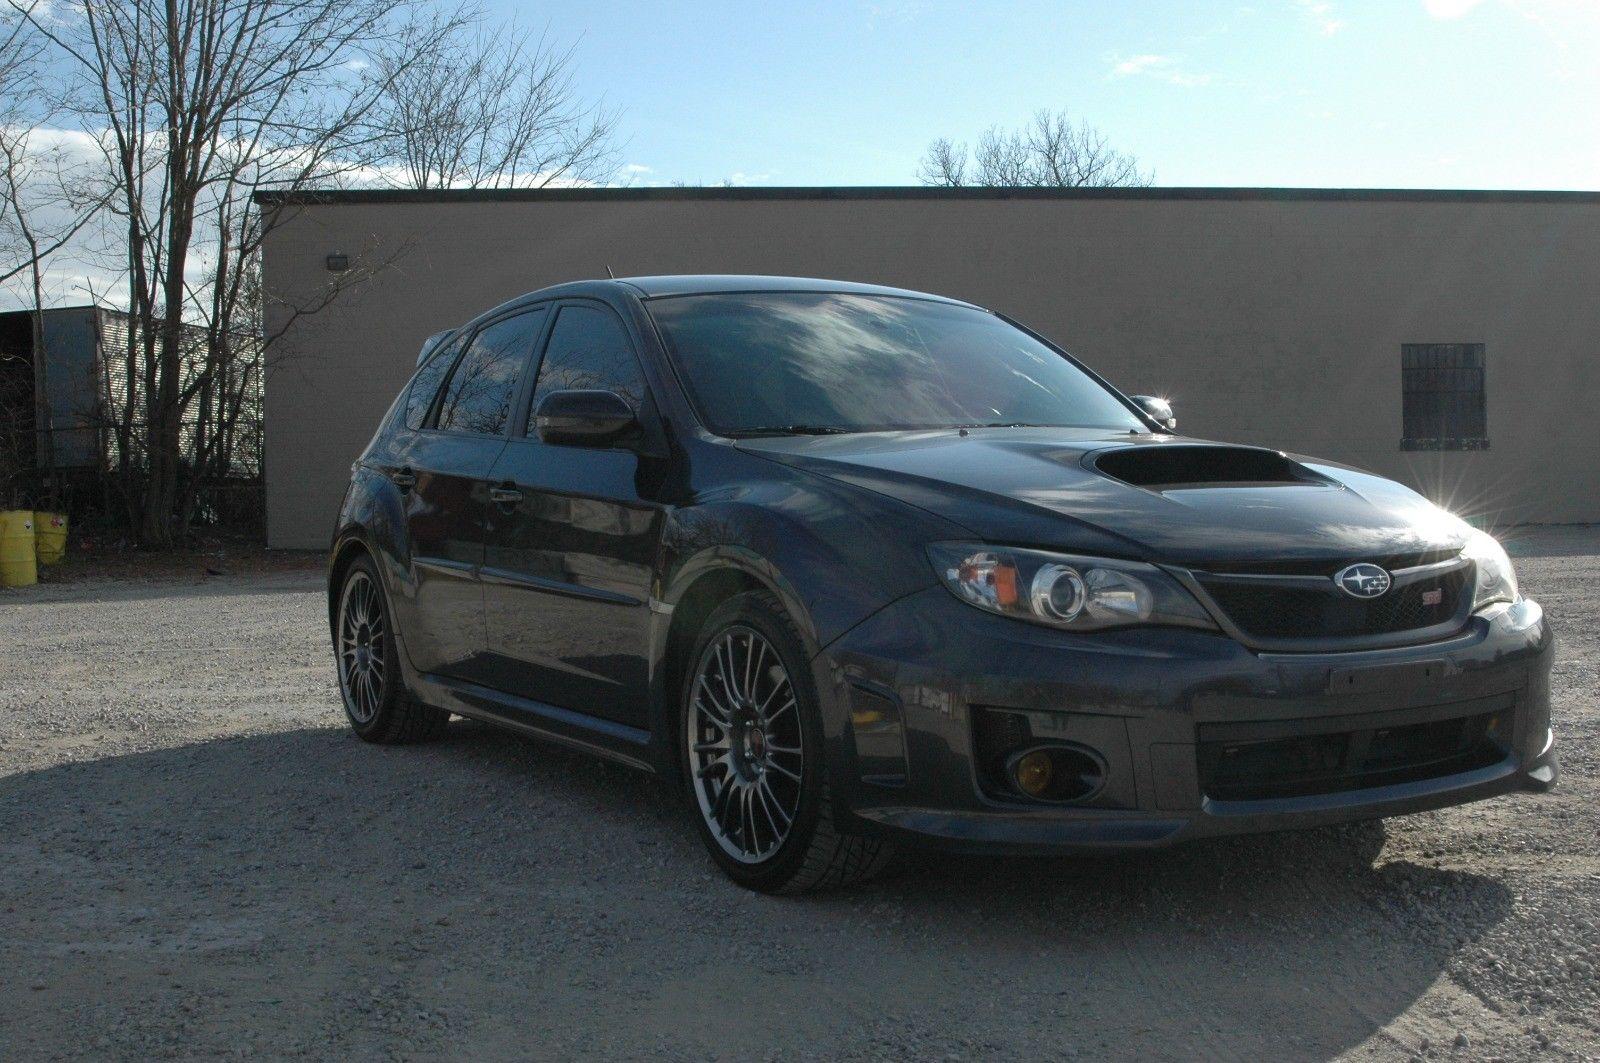 Awesome 2011 Subaru Impreza WRX STI 2011 Subaru Impreza ...